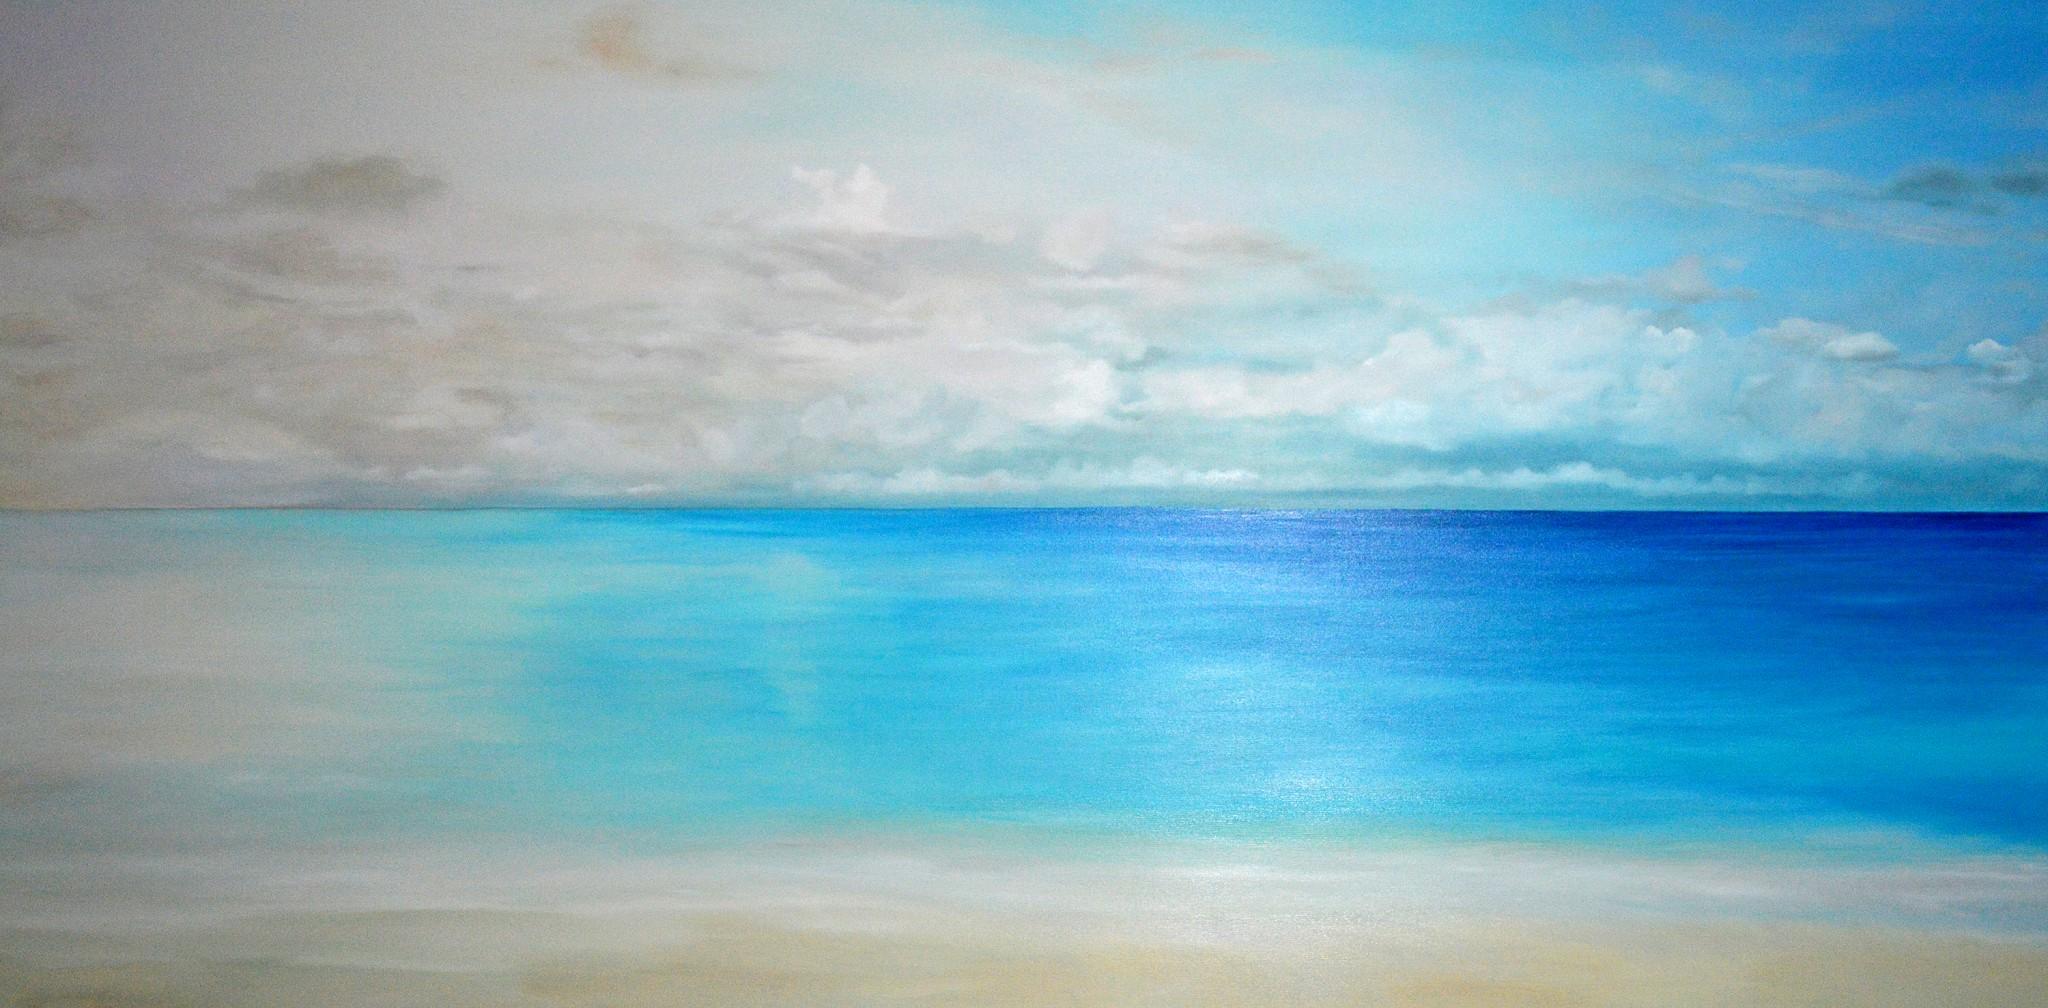 Horizont, Öl auf Leinwand, 200cm x 100cm